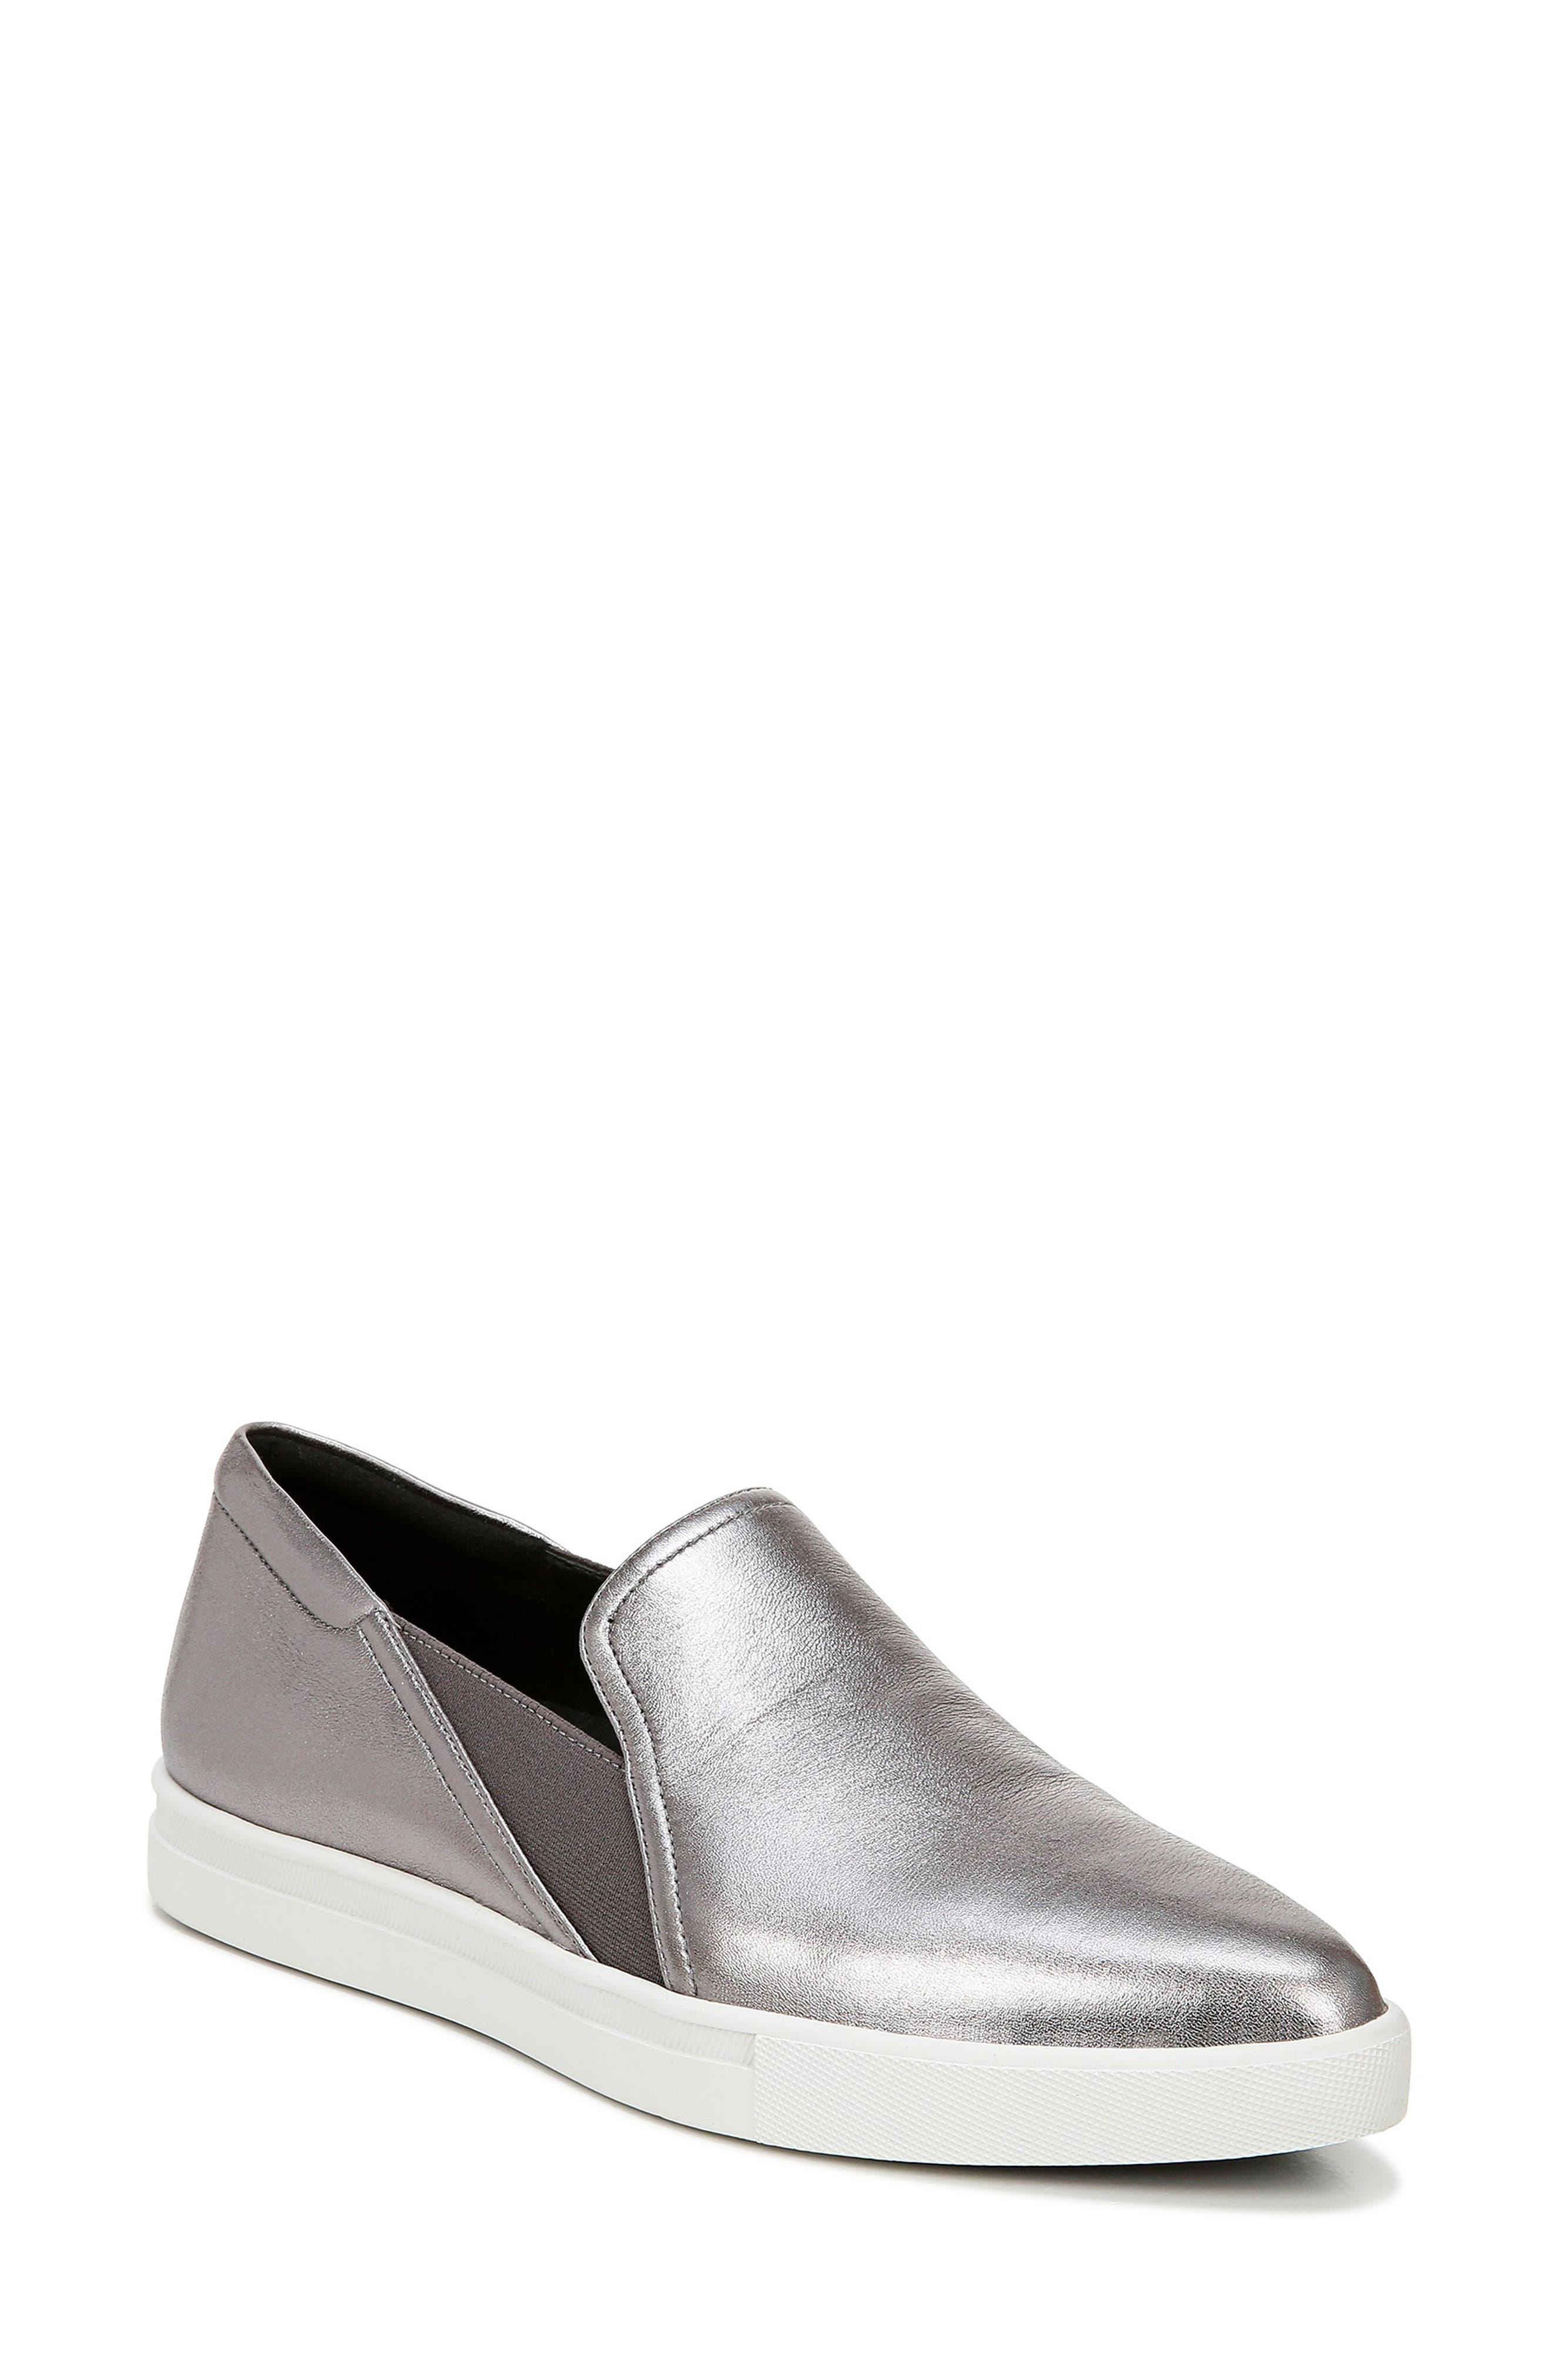 Women's Slip-Ons 27 Edit Shoes   Nordstrom